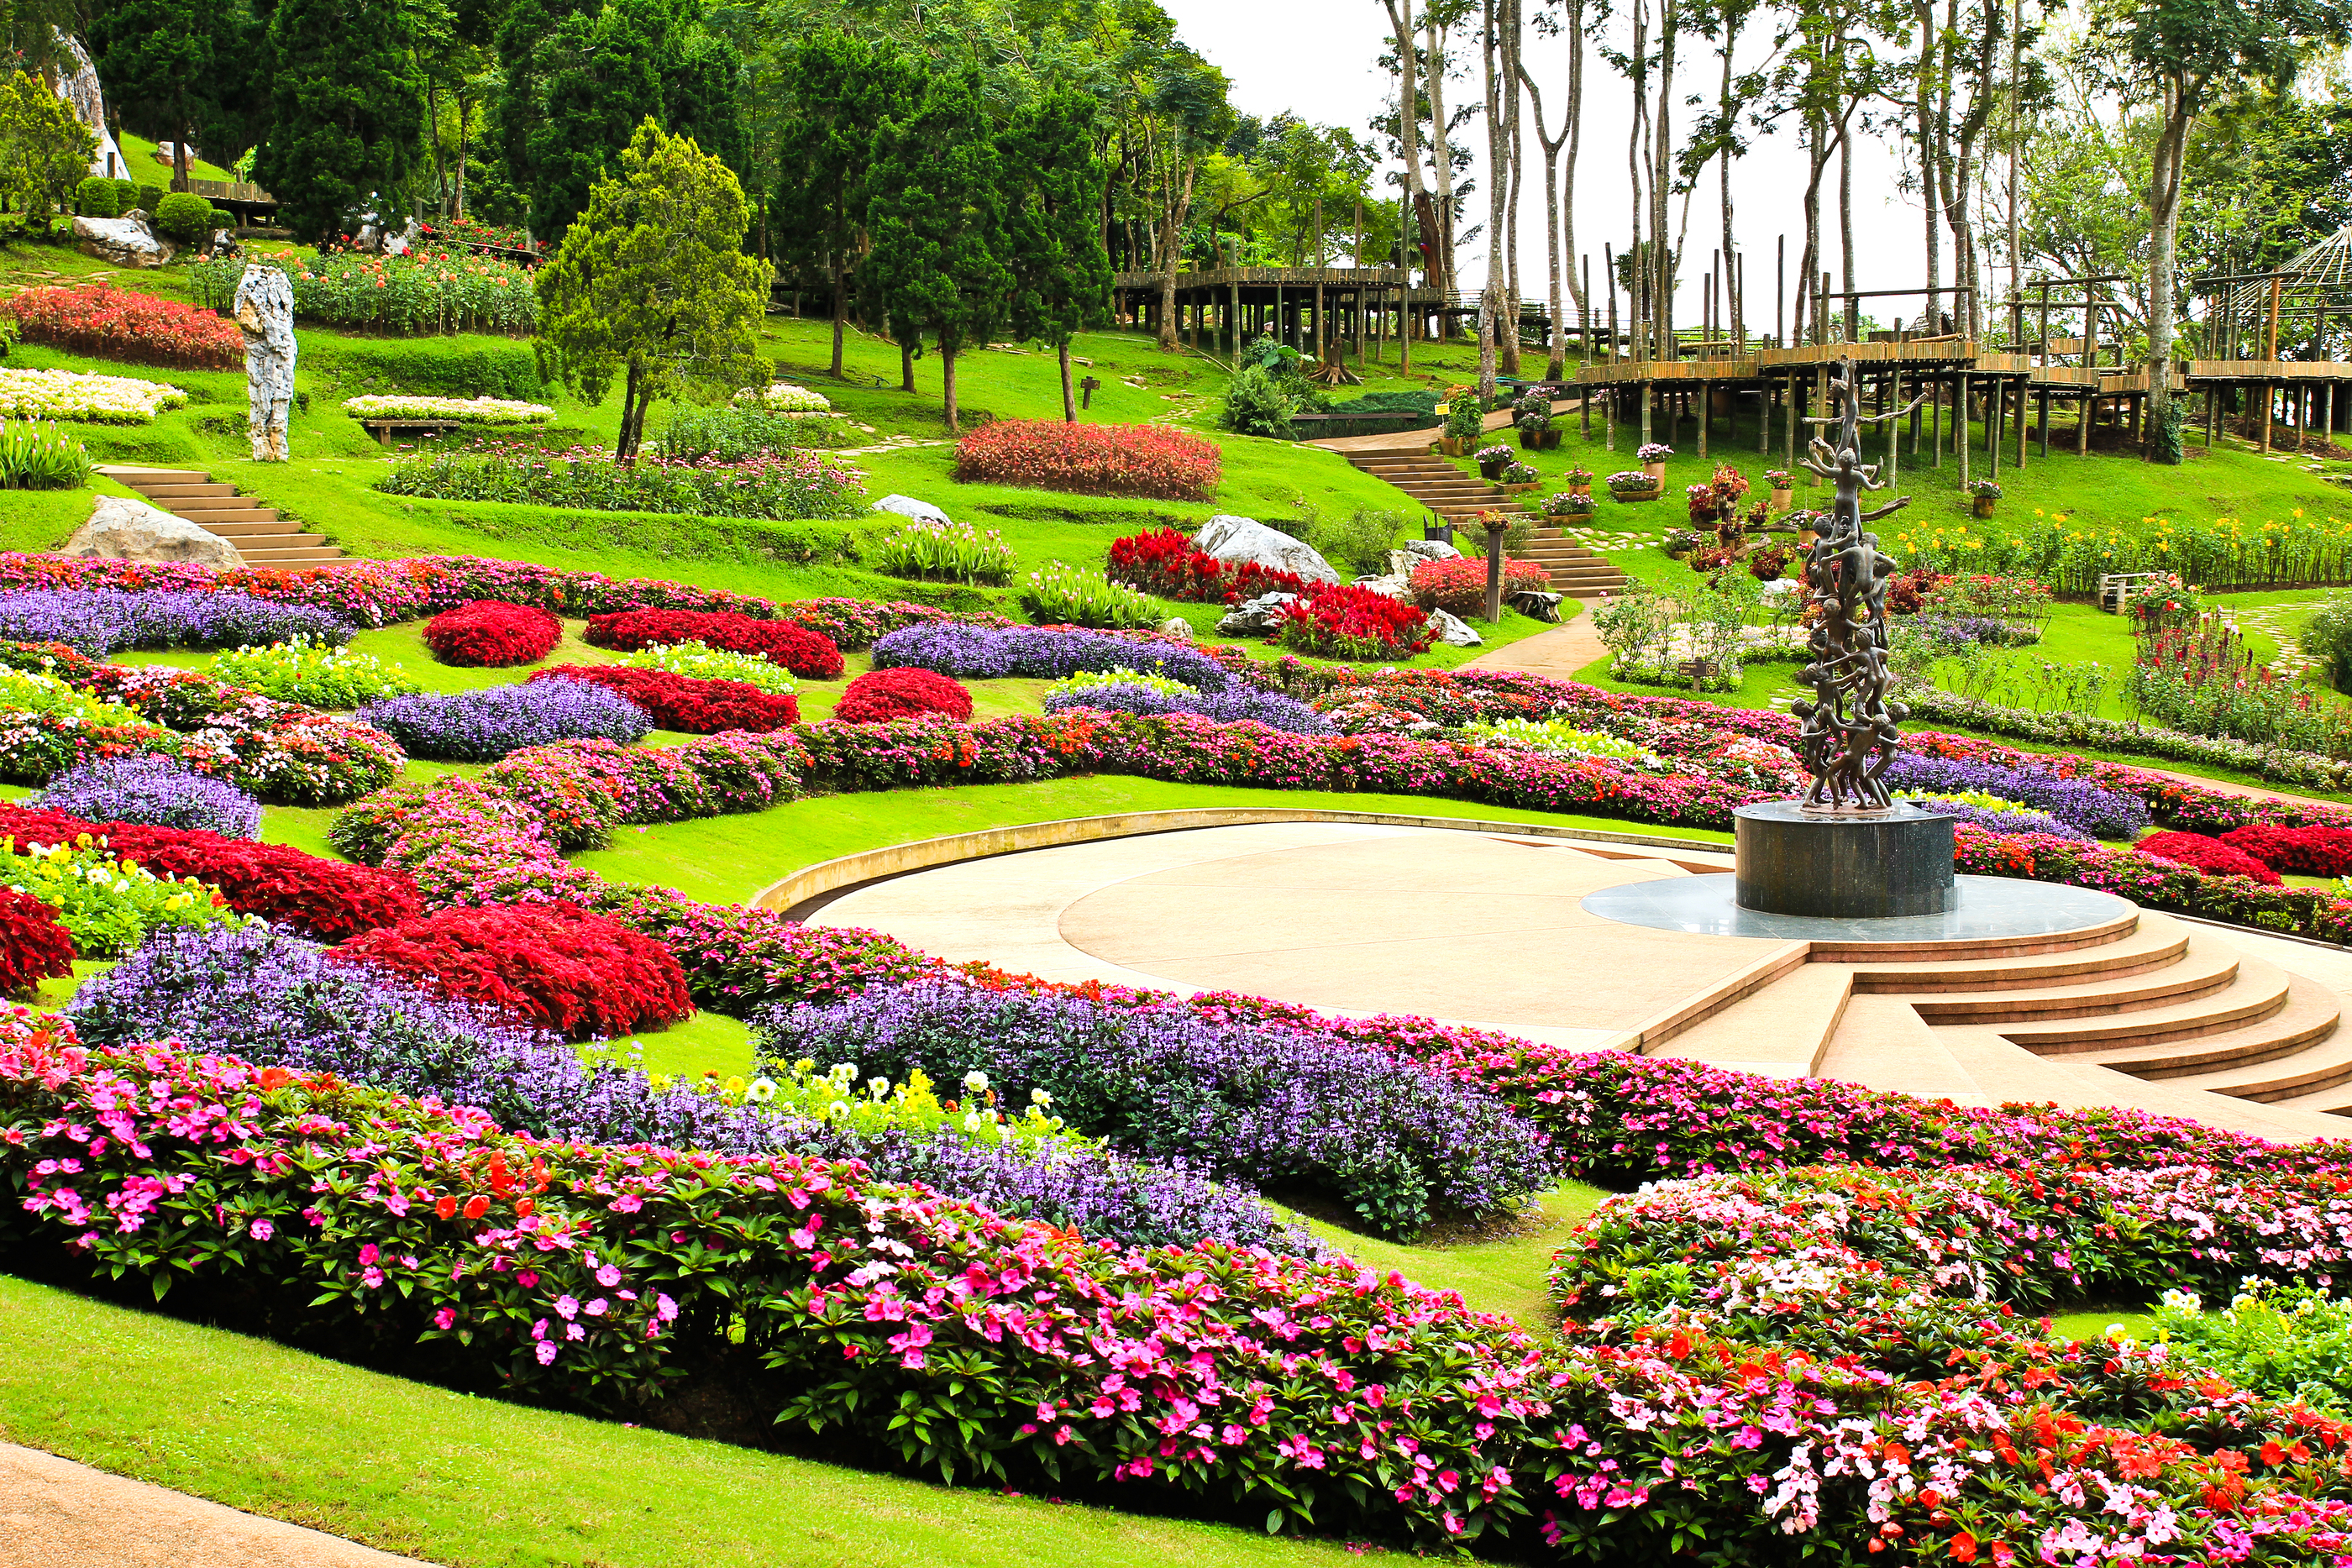 bigstock-Mae-Fah-Luang-Garden-locate-On-55593923